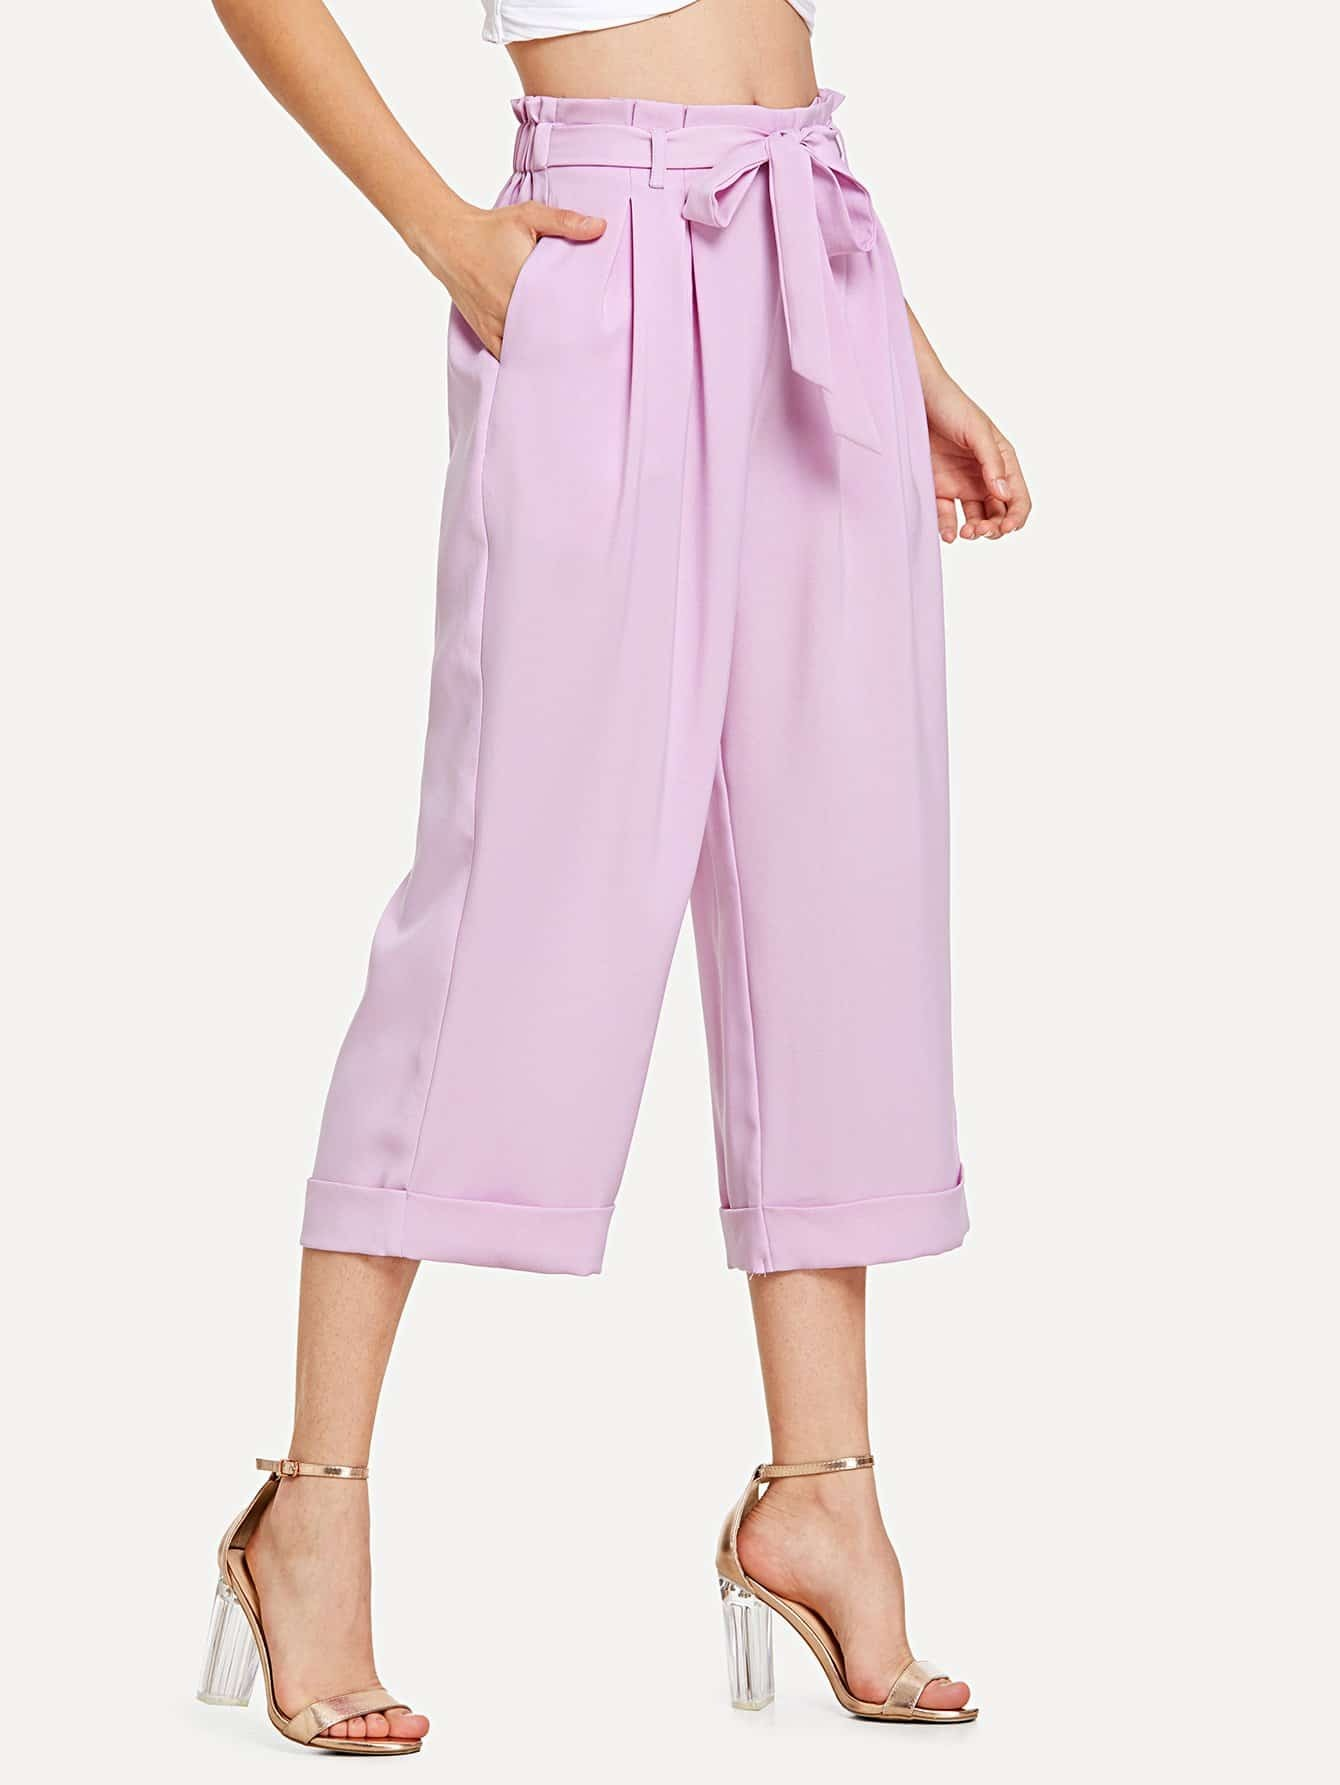 Tie Waist Fold Pleat Detail Culotte Pants box pleat detail palazzo pants